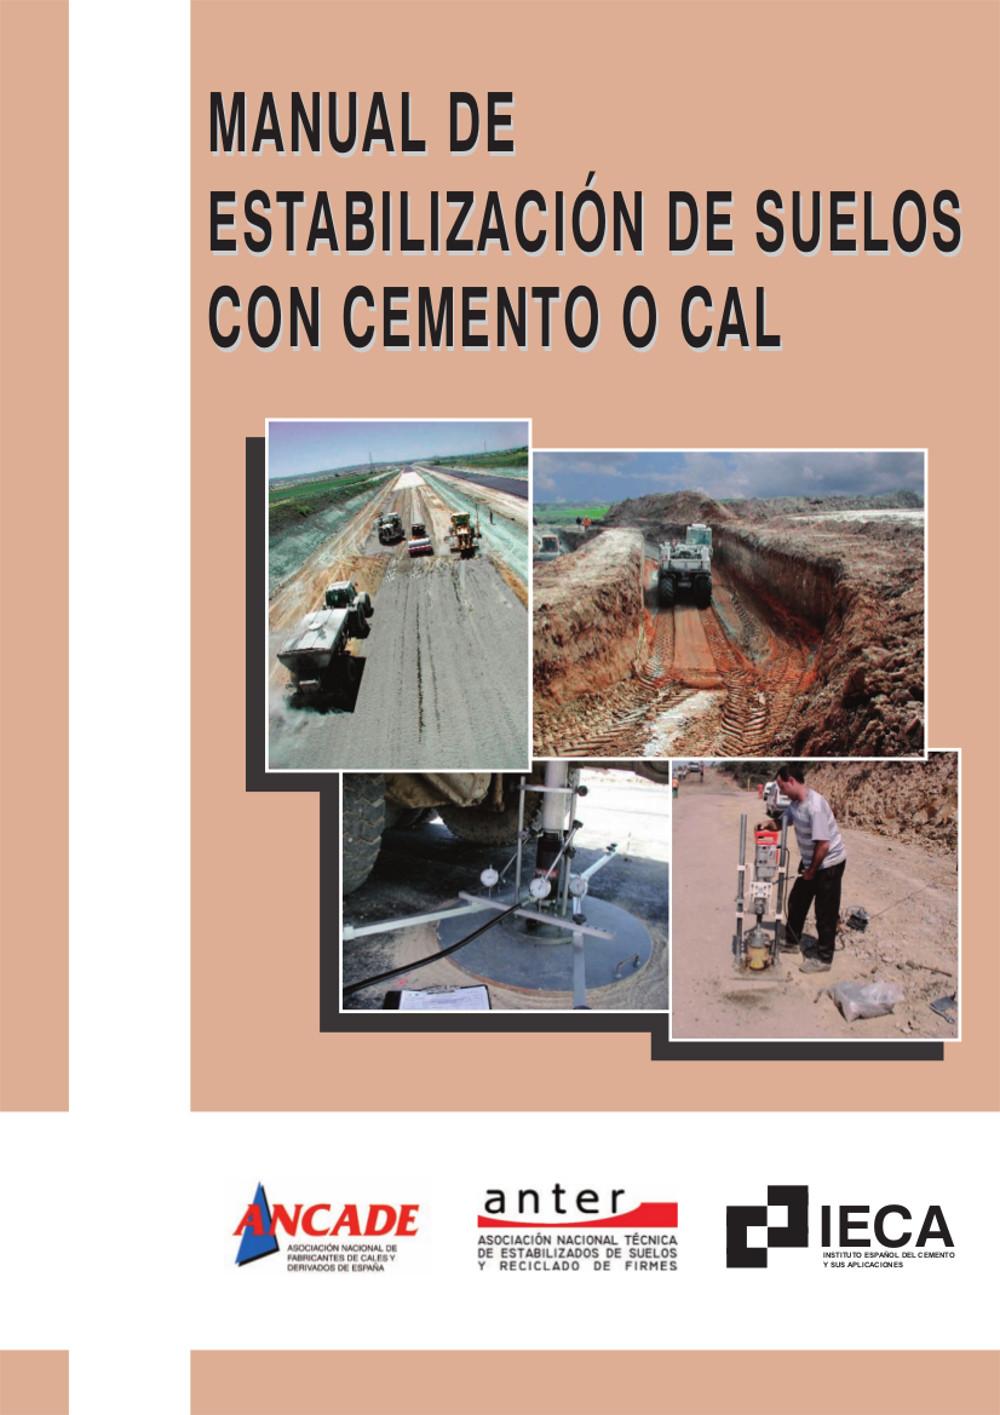 Manual de estabilización de suelos con cemento o cal